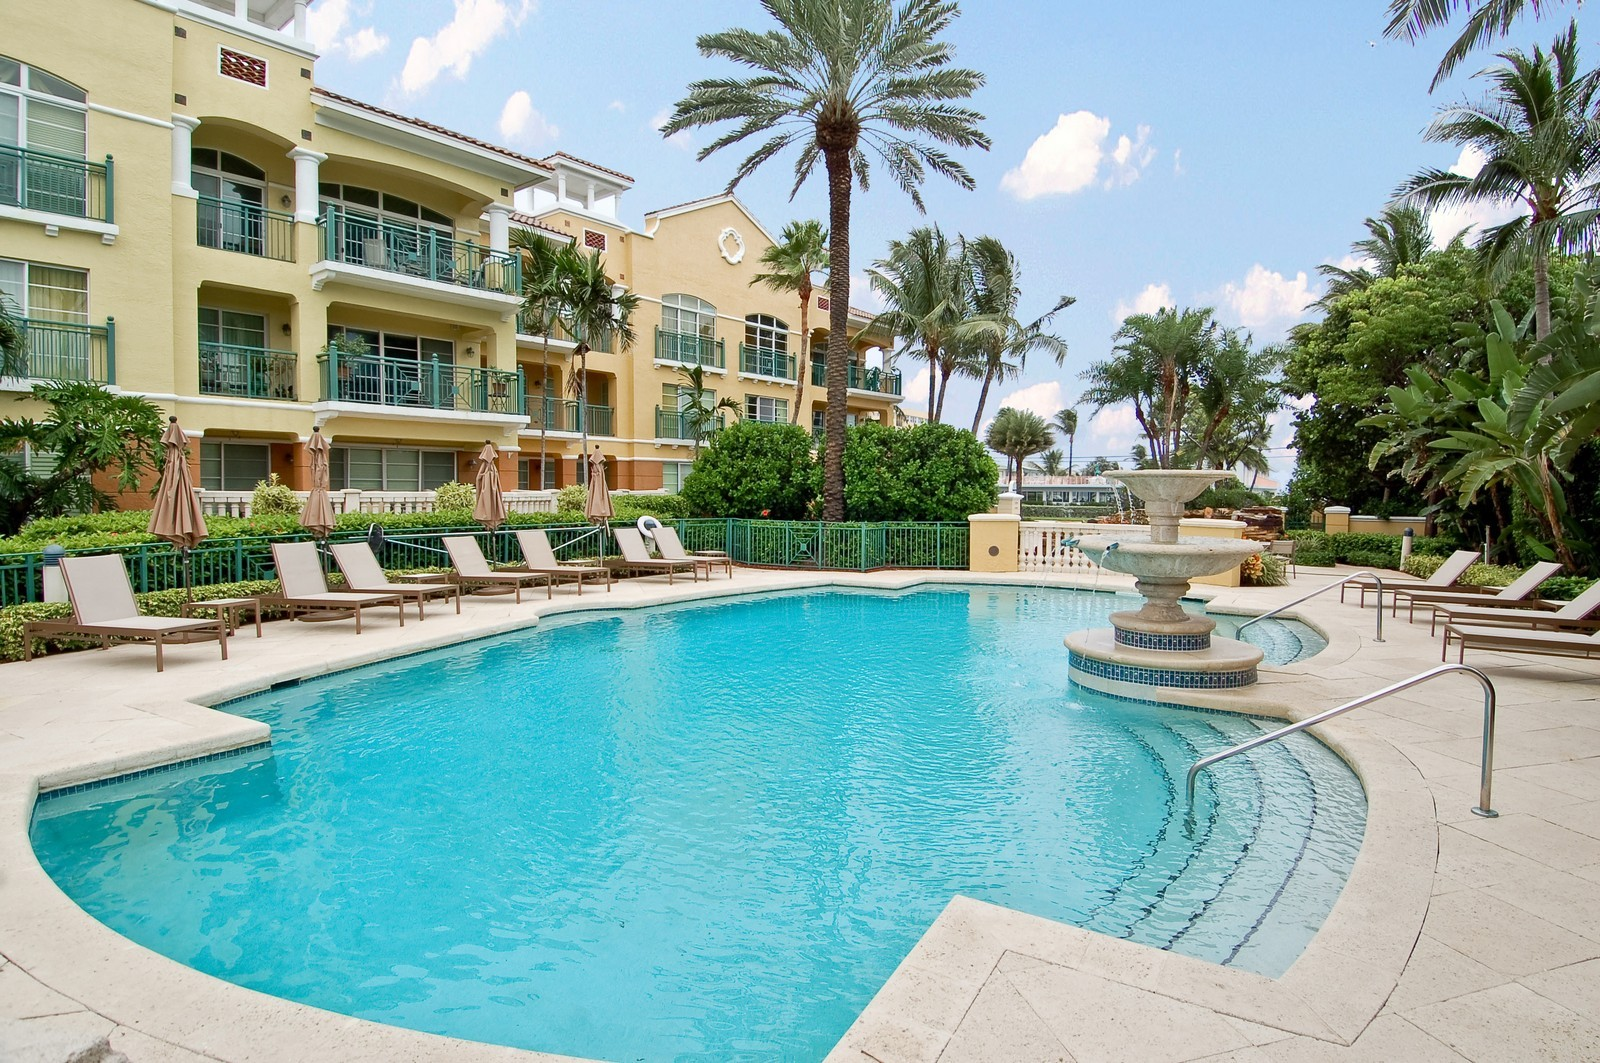 Real Estate Photography - 1230 Hillsboro Mile, Hillsboro Beach, FL, 33062 - Pool